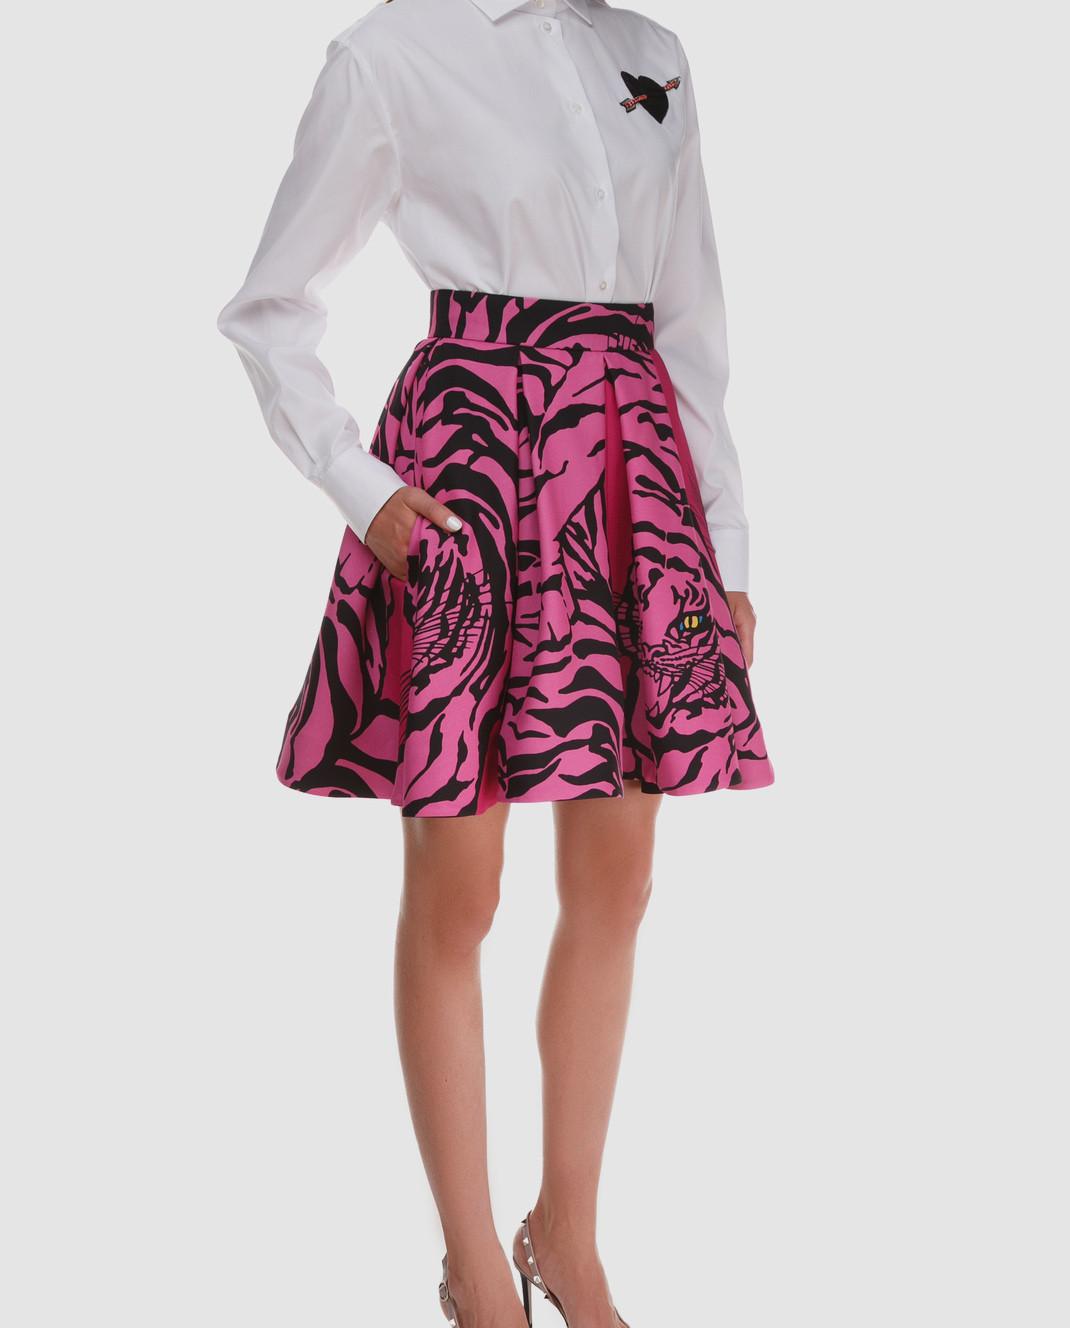 Valentino Розовая юбка из шерсти и шелка QB3RA3W546B изображение 2